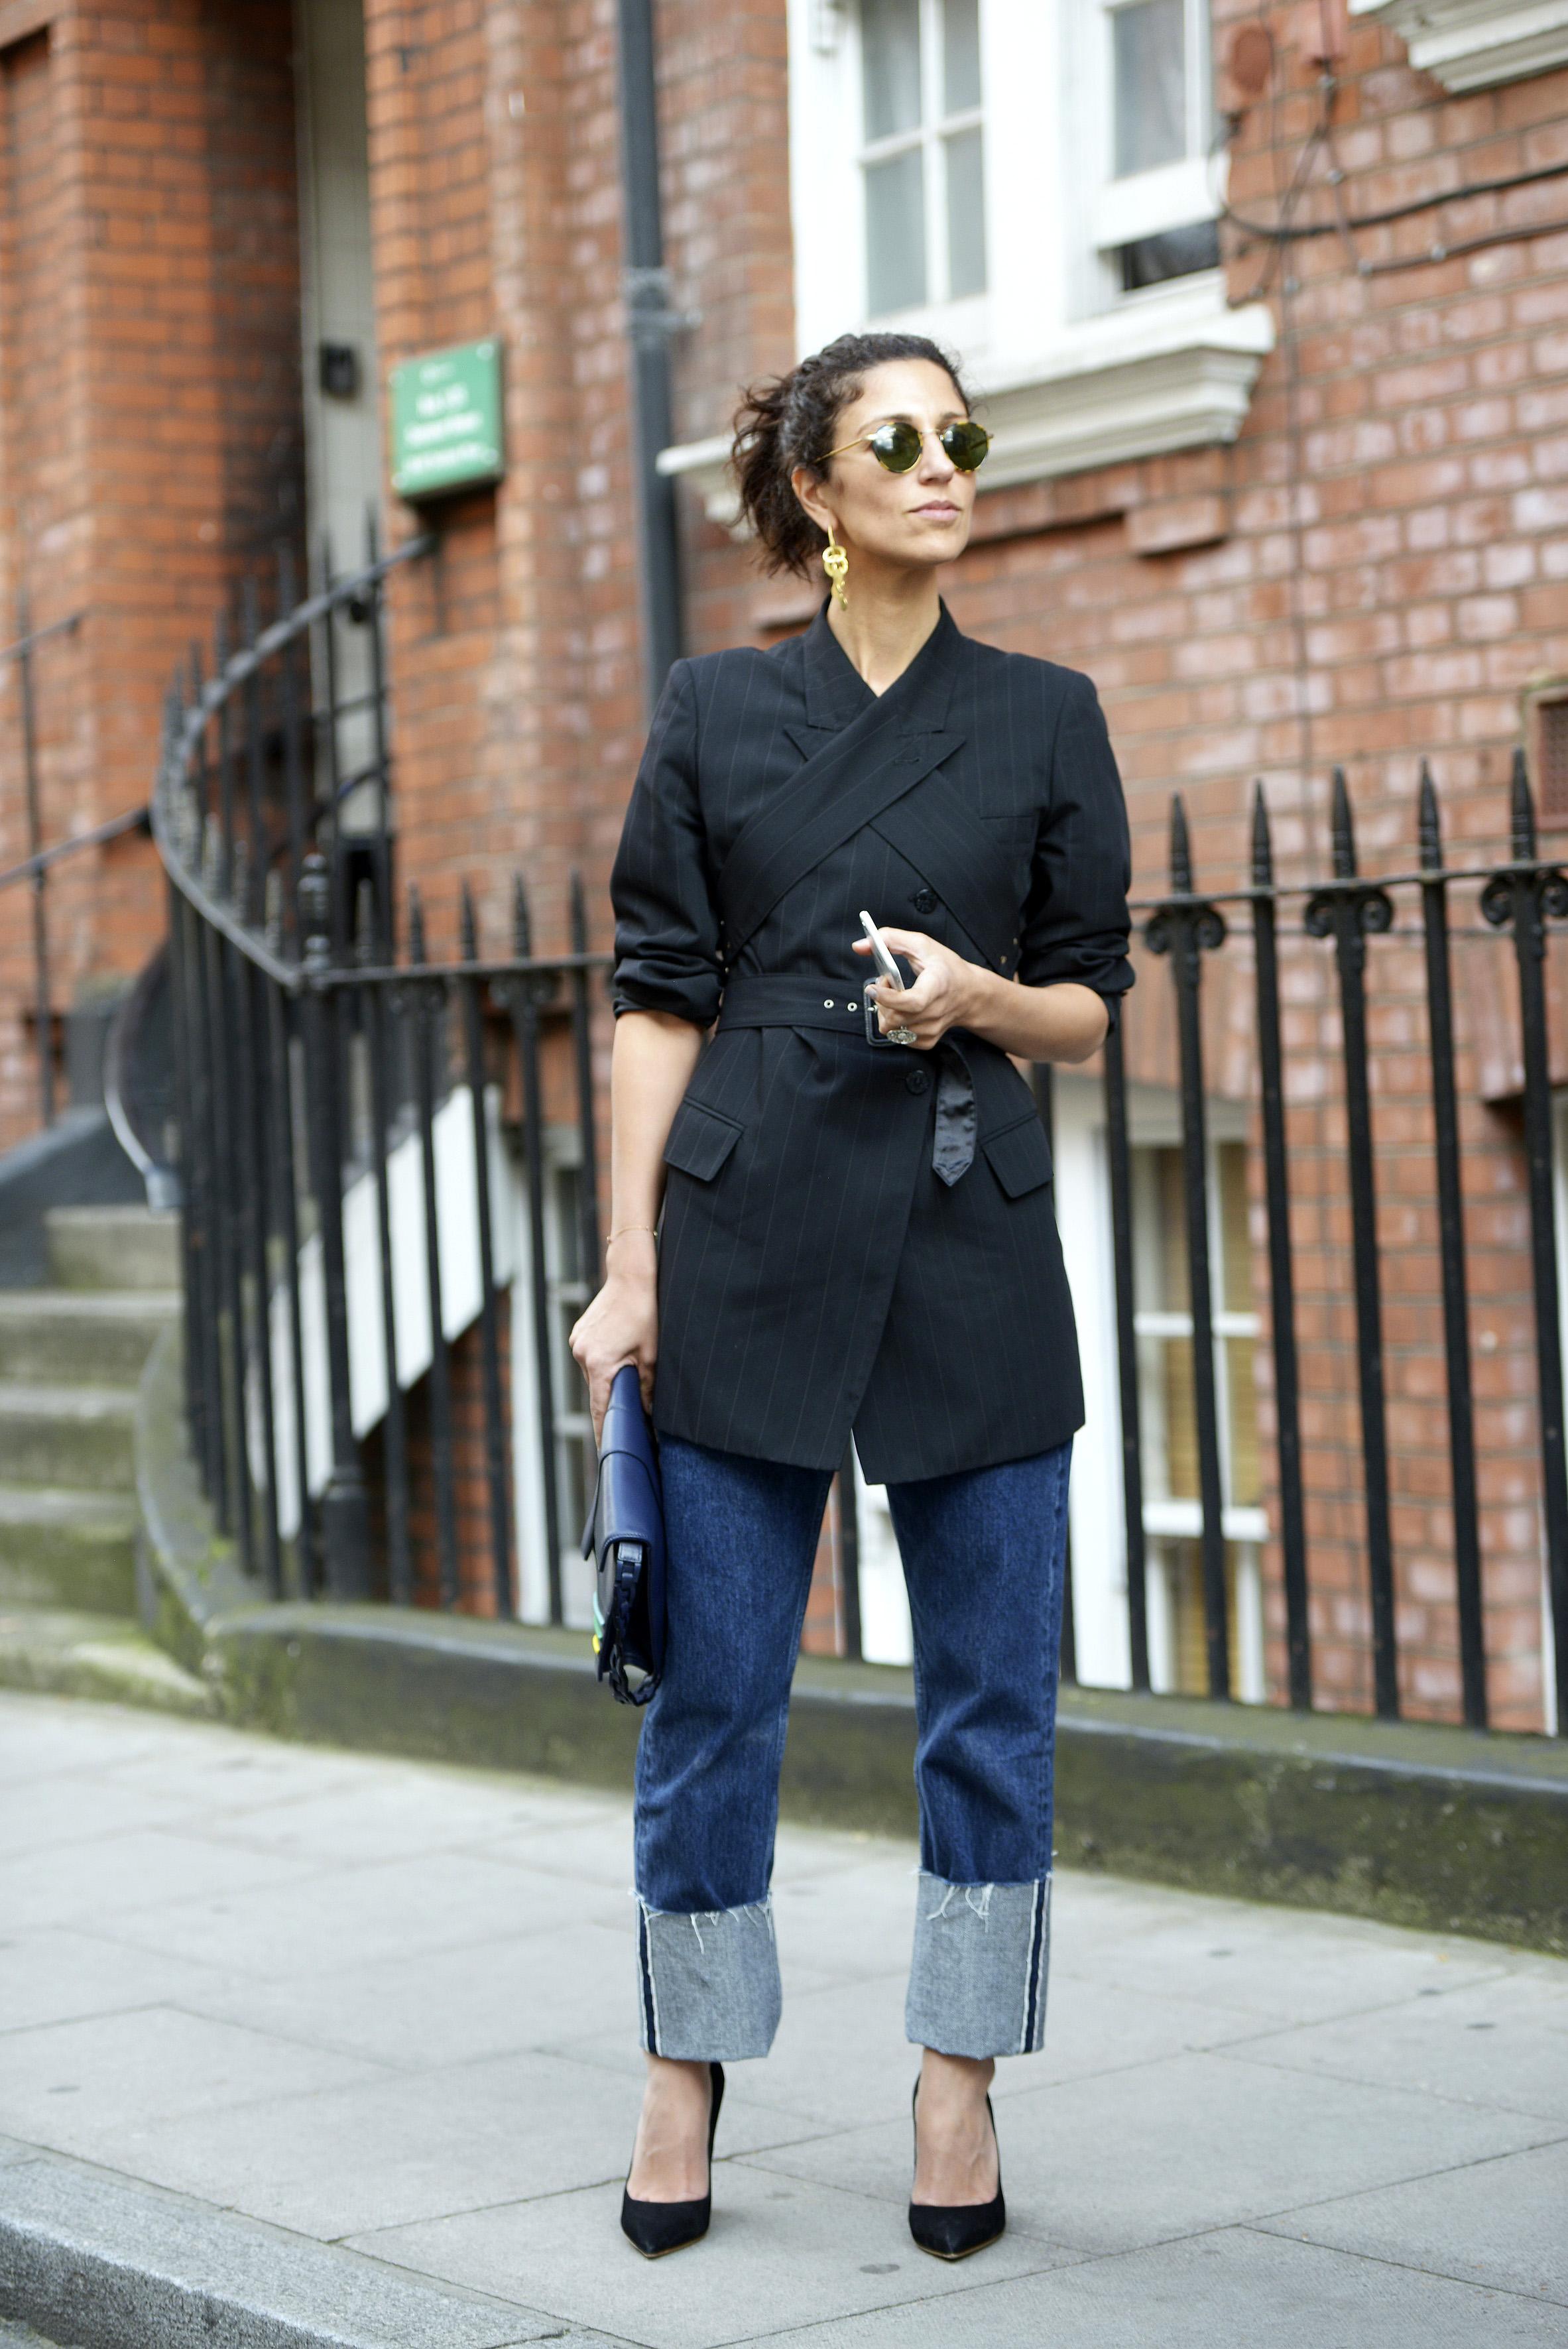 Yasmin sewell streestyle Fashion director modepilot